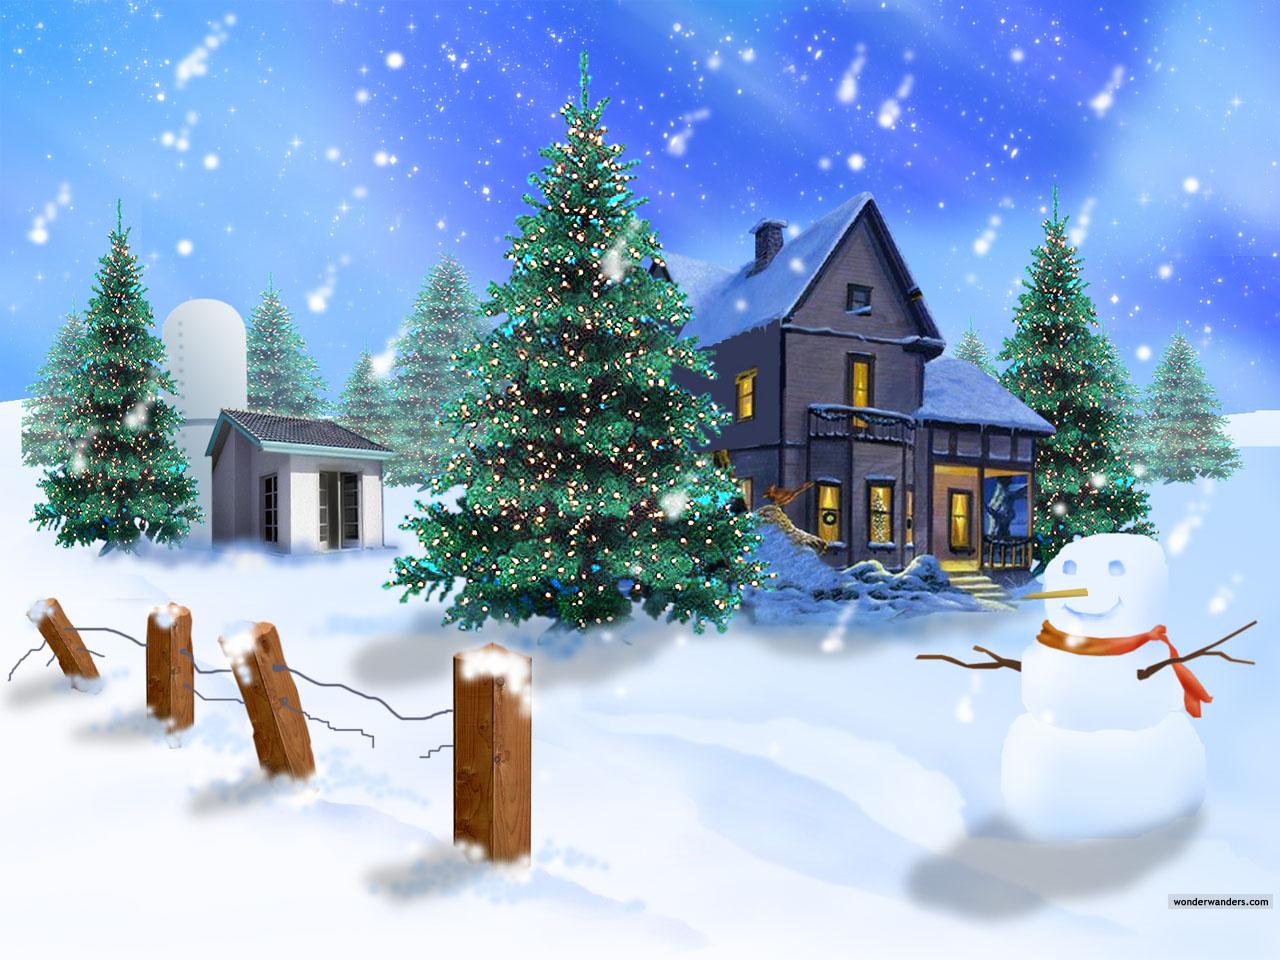 wallpaper christmas,wallpaper christmas tree,wallpaper christmas scenes,wallpaper christmas lights,wallpaper christmas countdown